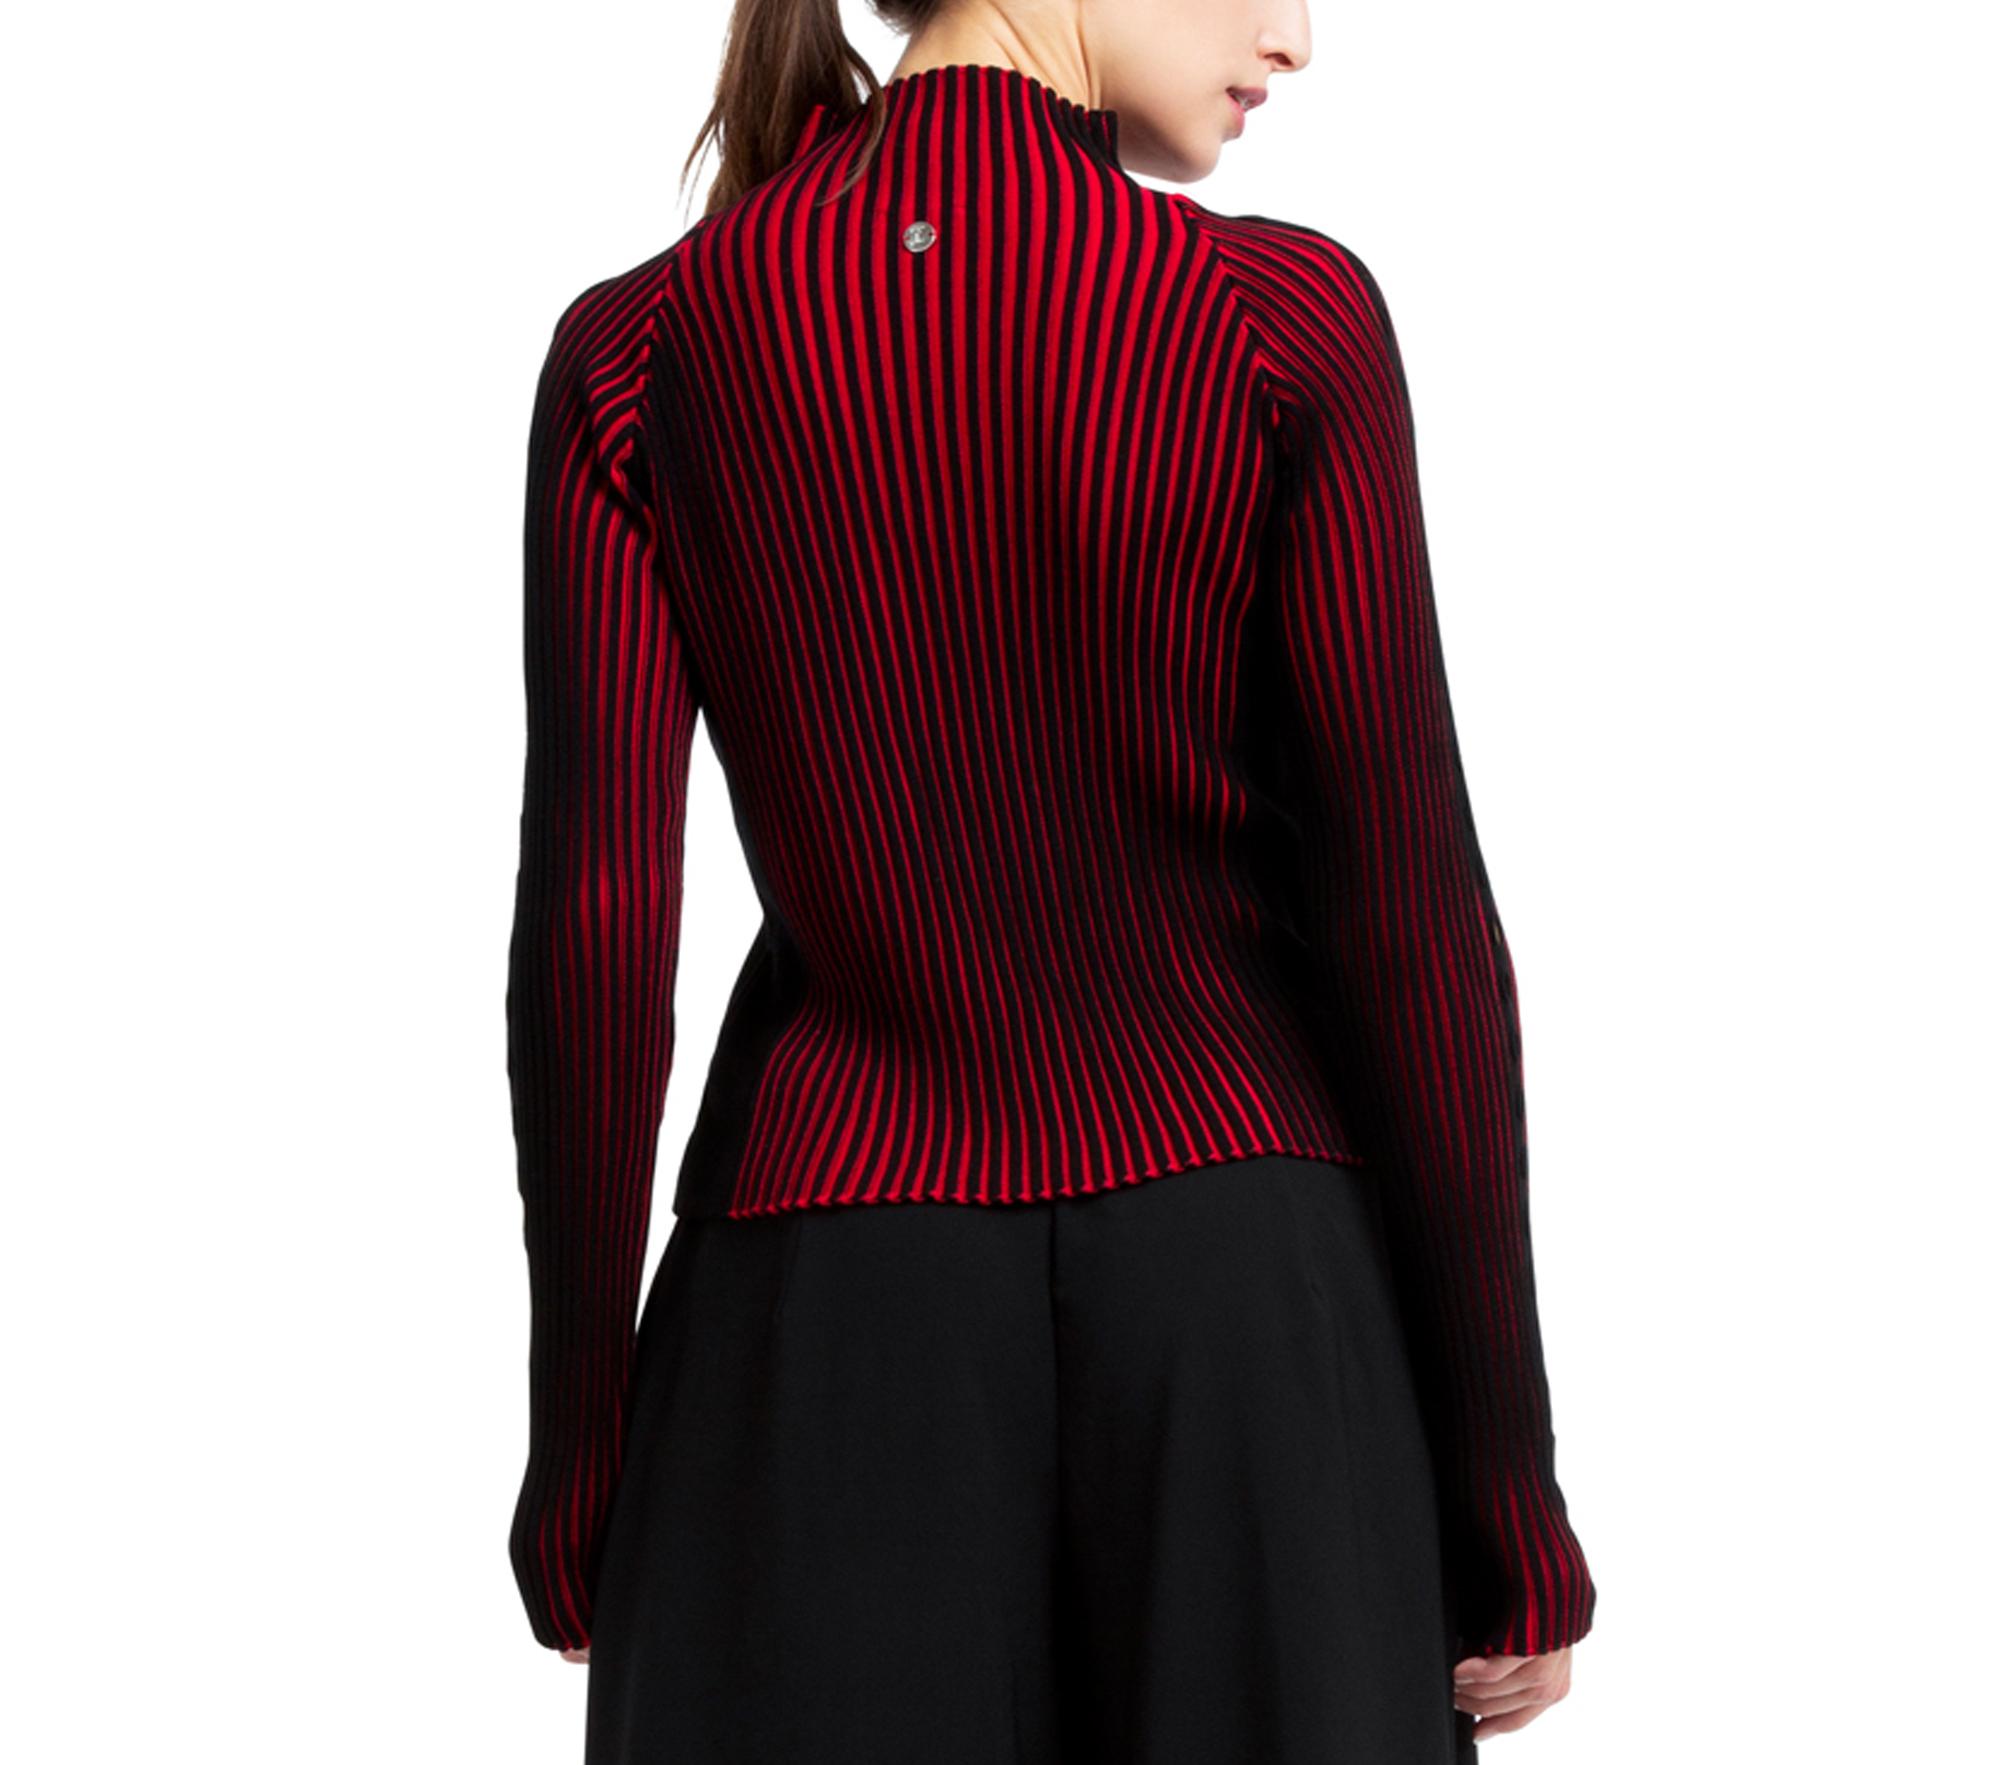 Bicolor rib knit sweater